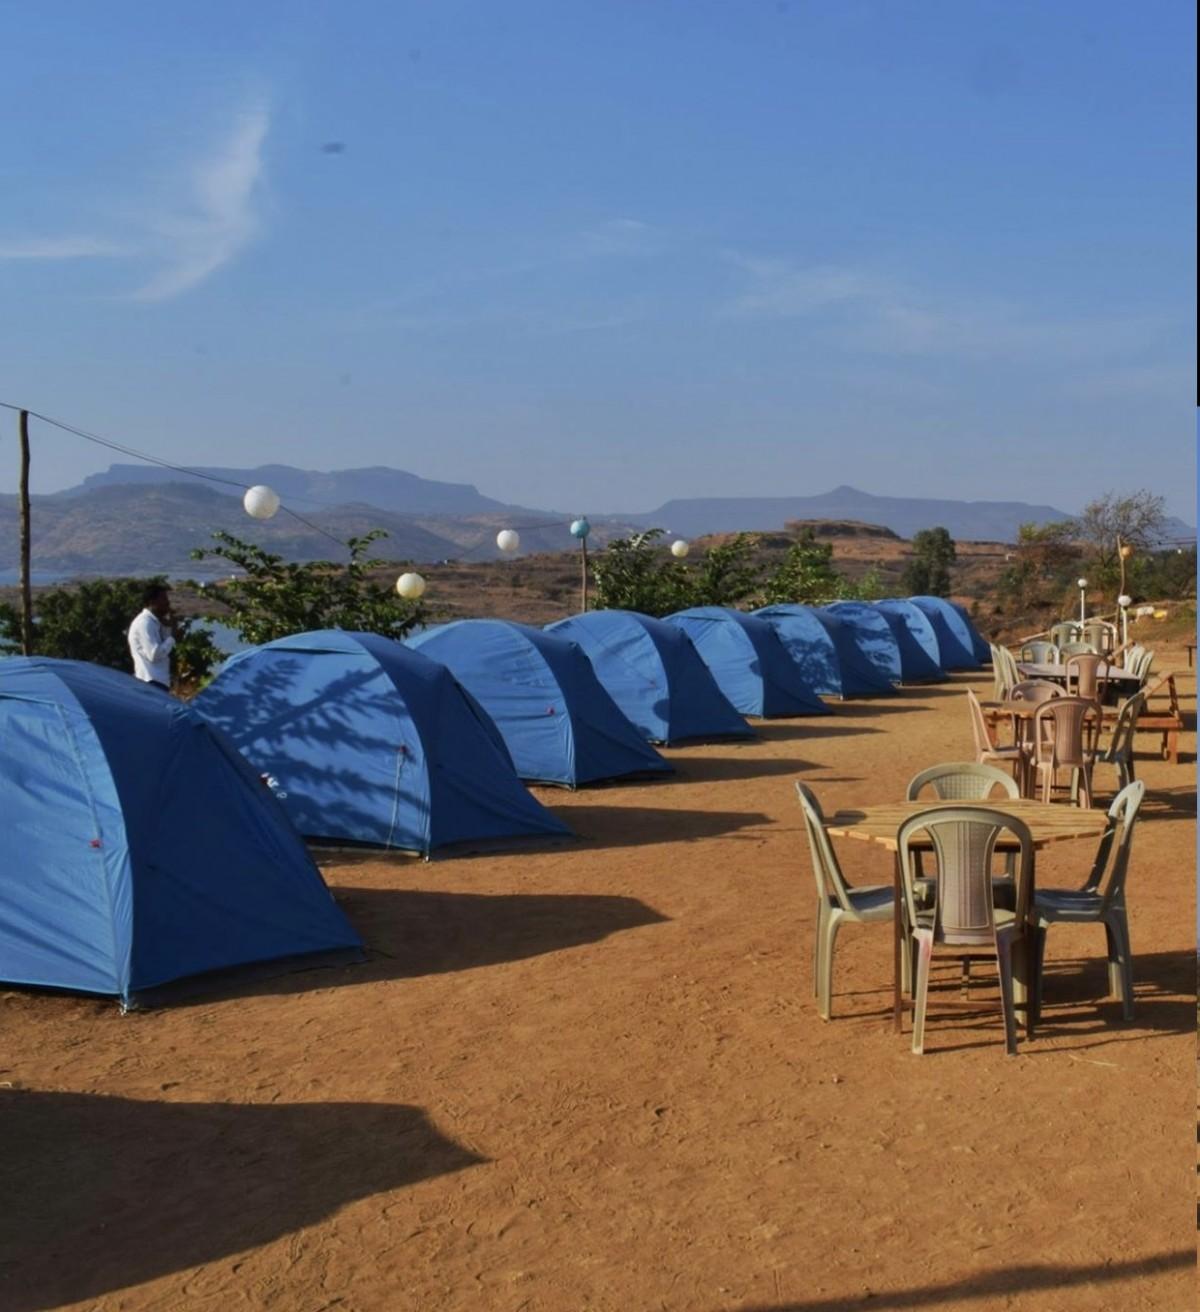 http://www.thegreatnext.com/Camping Pawna Maharashtra Adventure Travel The Great Next